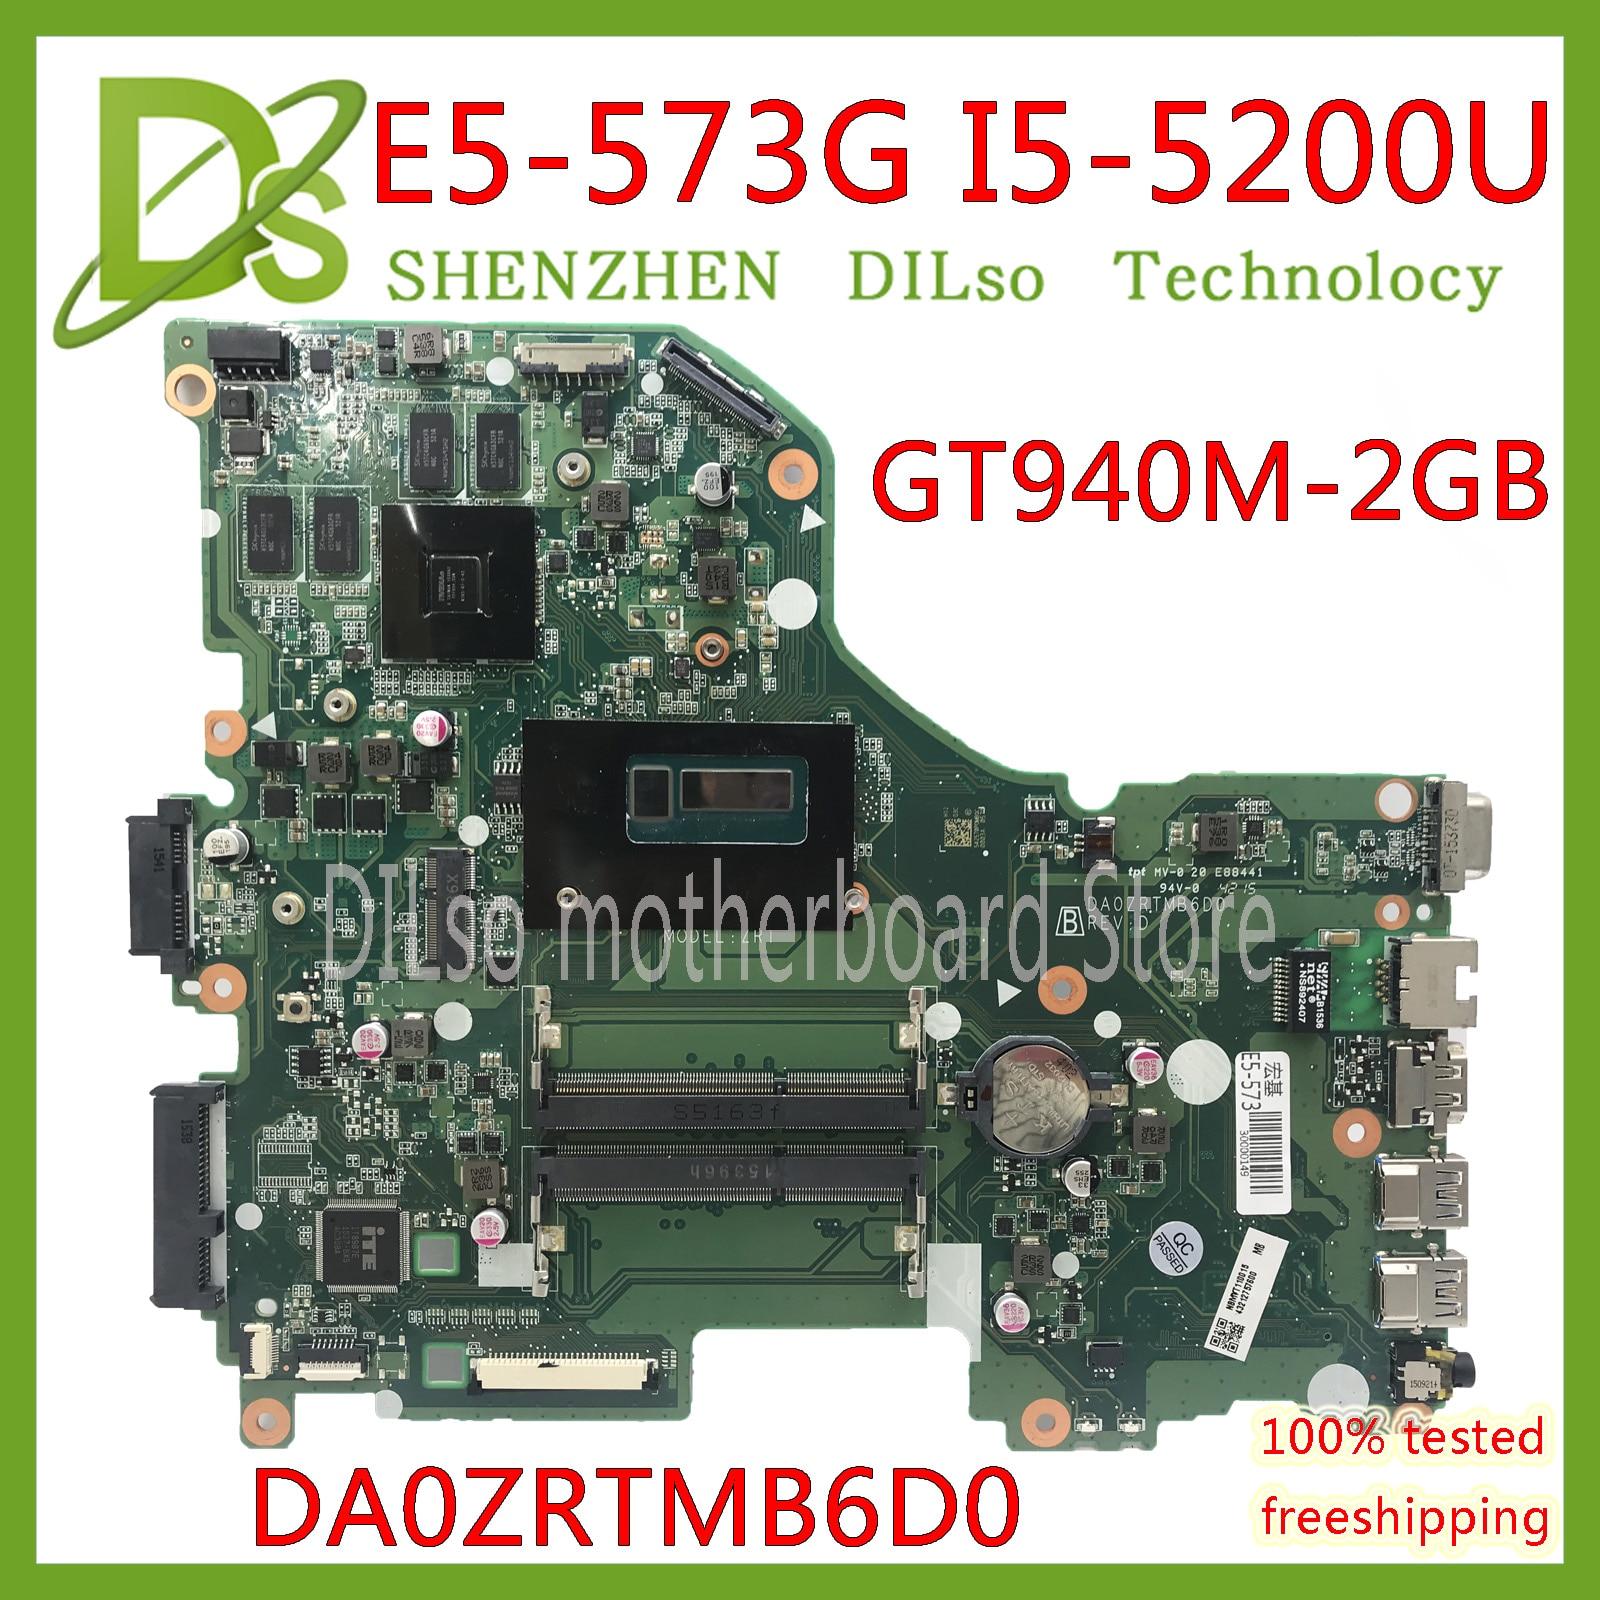 KEFU E5-573G Mainboard For Acer Aspire E5-573G E5-573 Motherboard I5-5200U GT940M -2GB DA0ZRTMB6D0 Test Work 100% Original